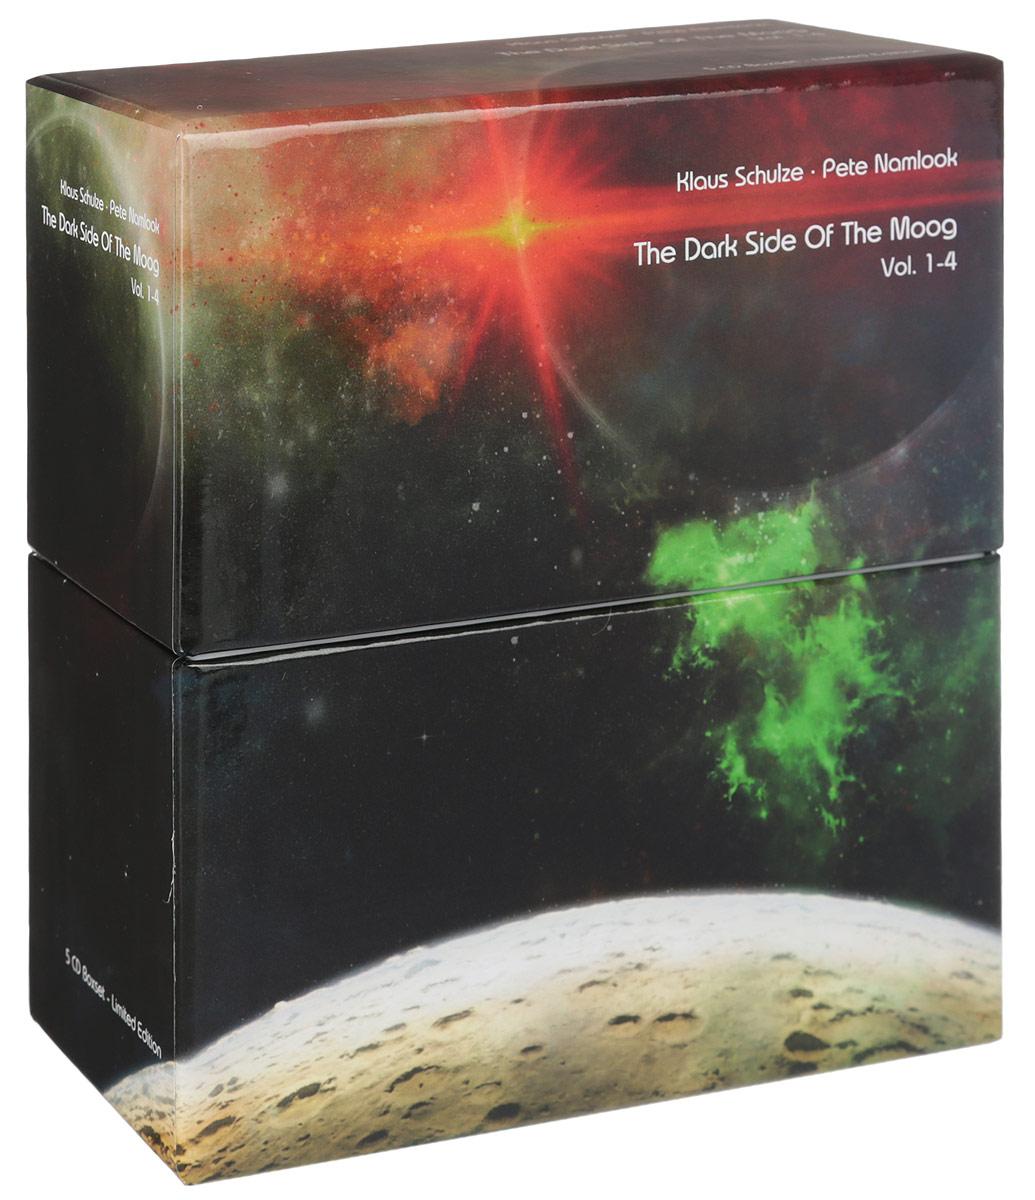 Клаус Шульце,Пит Нэмлук,Билл Лассвелл Klaus Schulze, Pete Namlook. The Dark Side Of The Moog. Vol. 1-4. Limited Edition (5 CD) roxy music roxy music the studio albums limited edition 8 lp